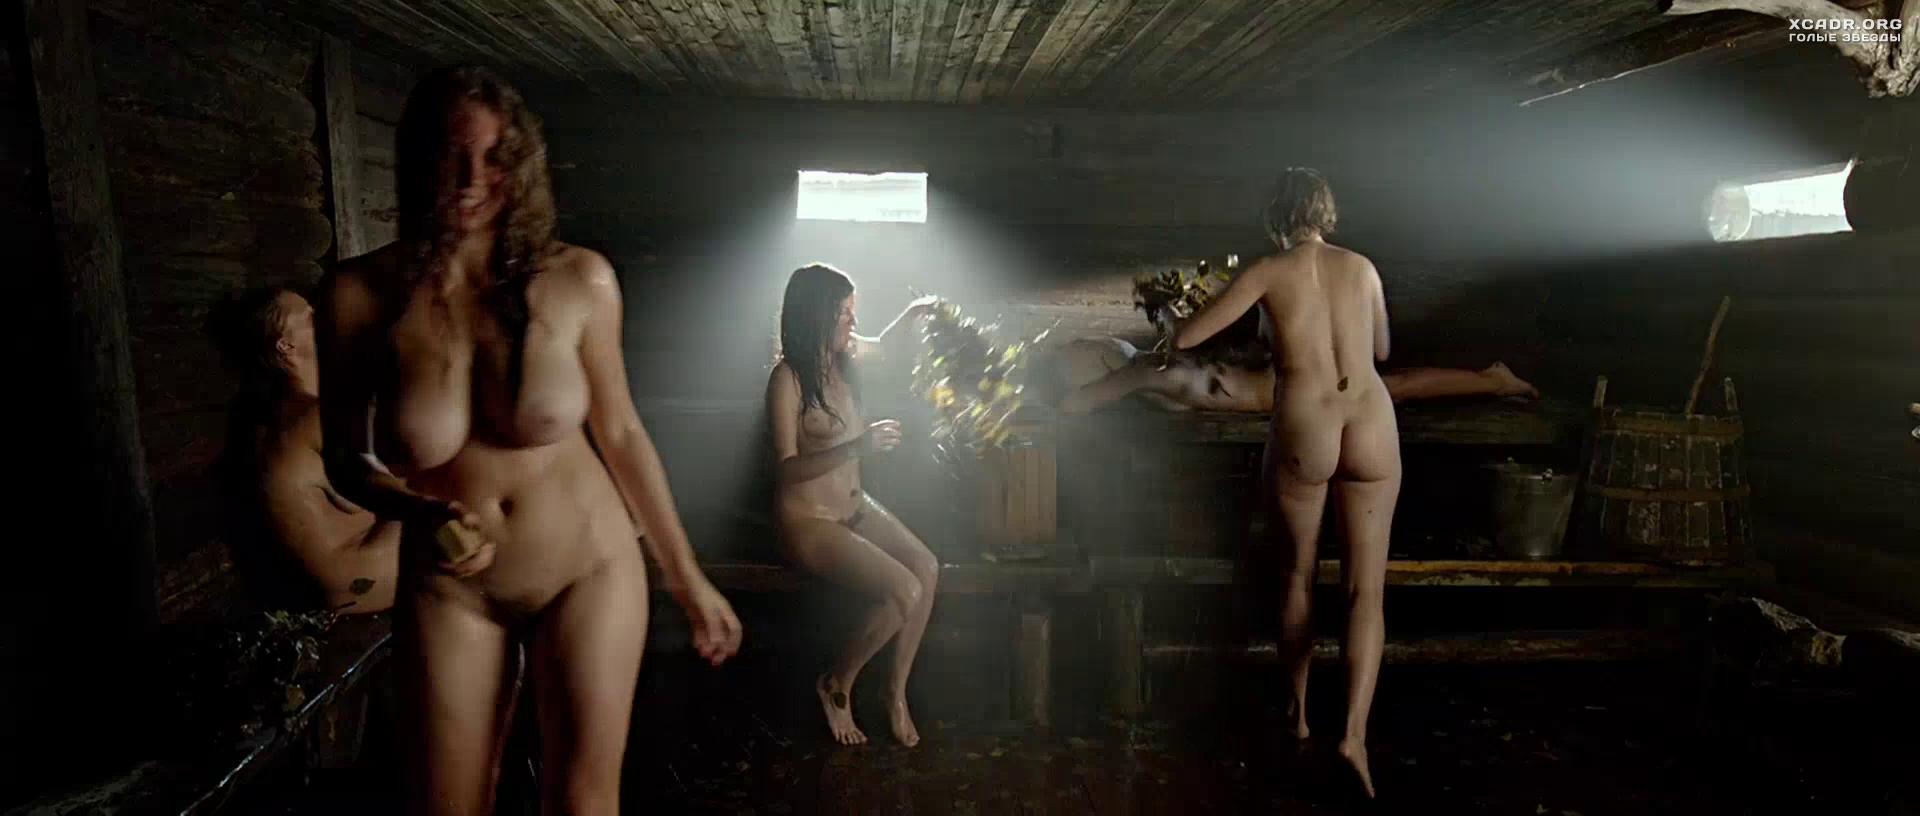 секс фото сцены в белой блузке julia ann